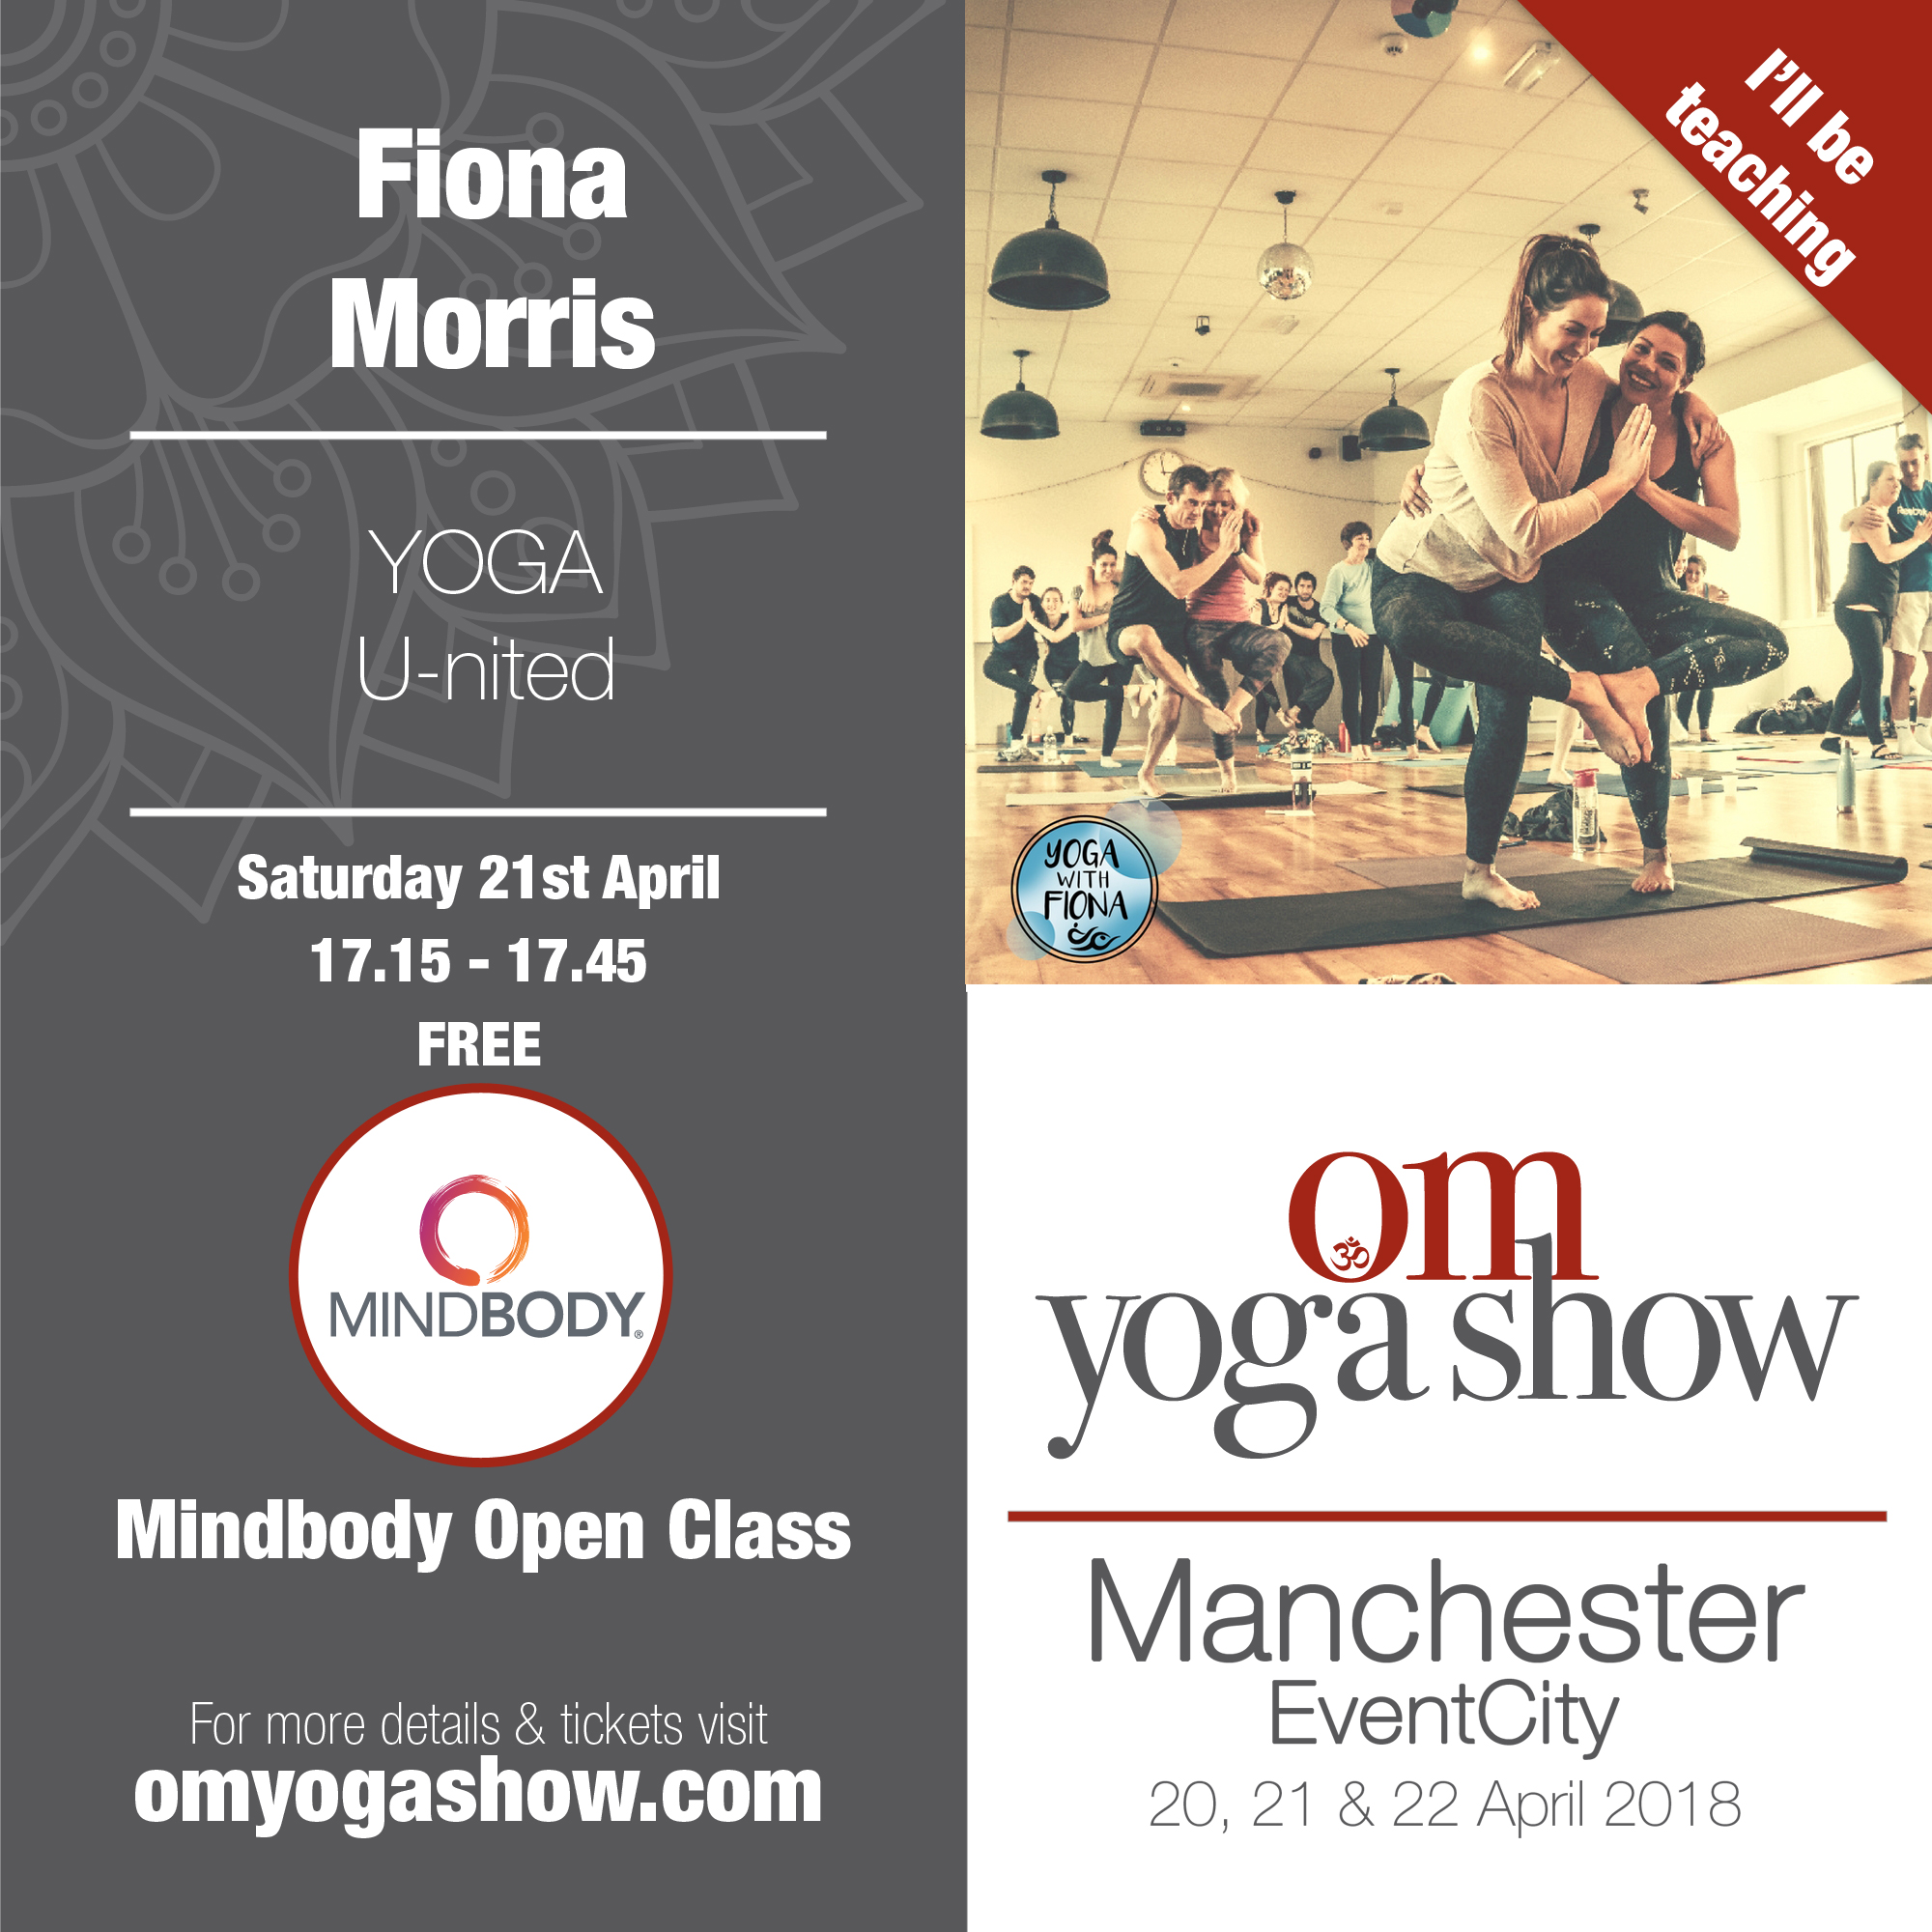 Fiona-Morris.jpg